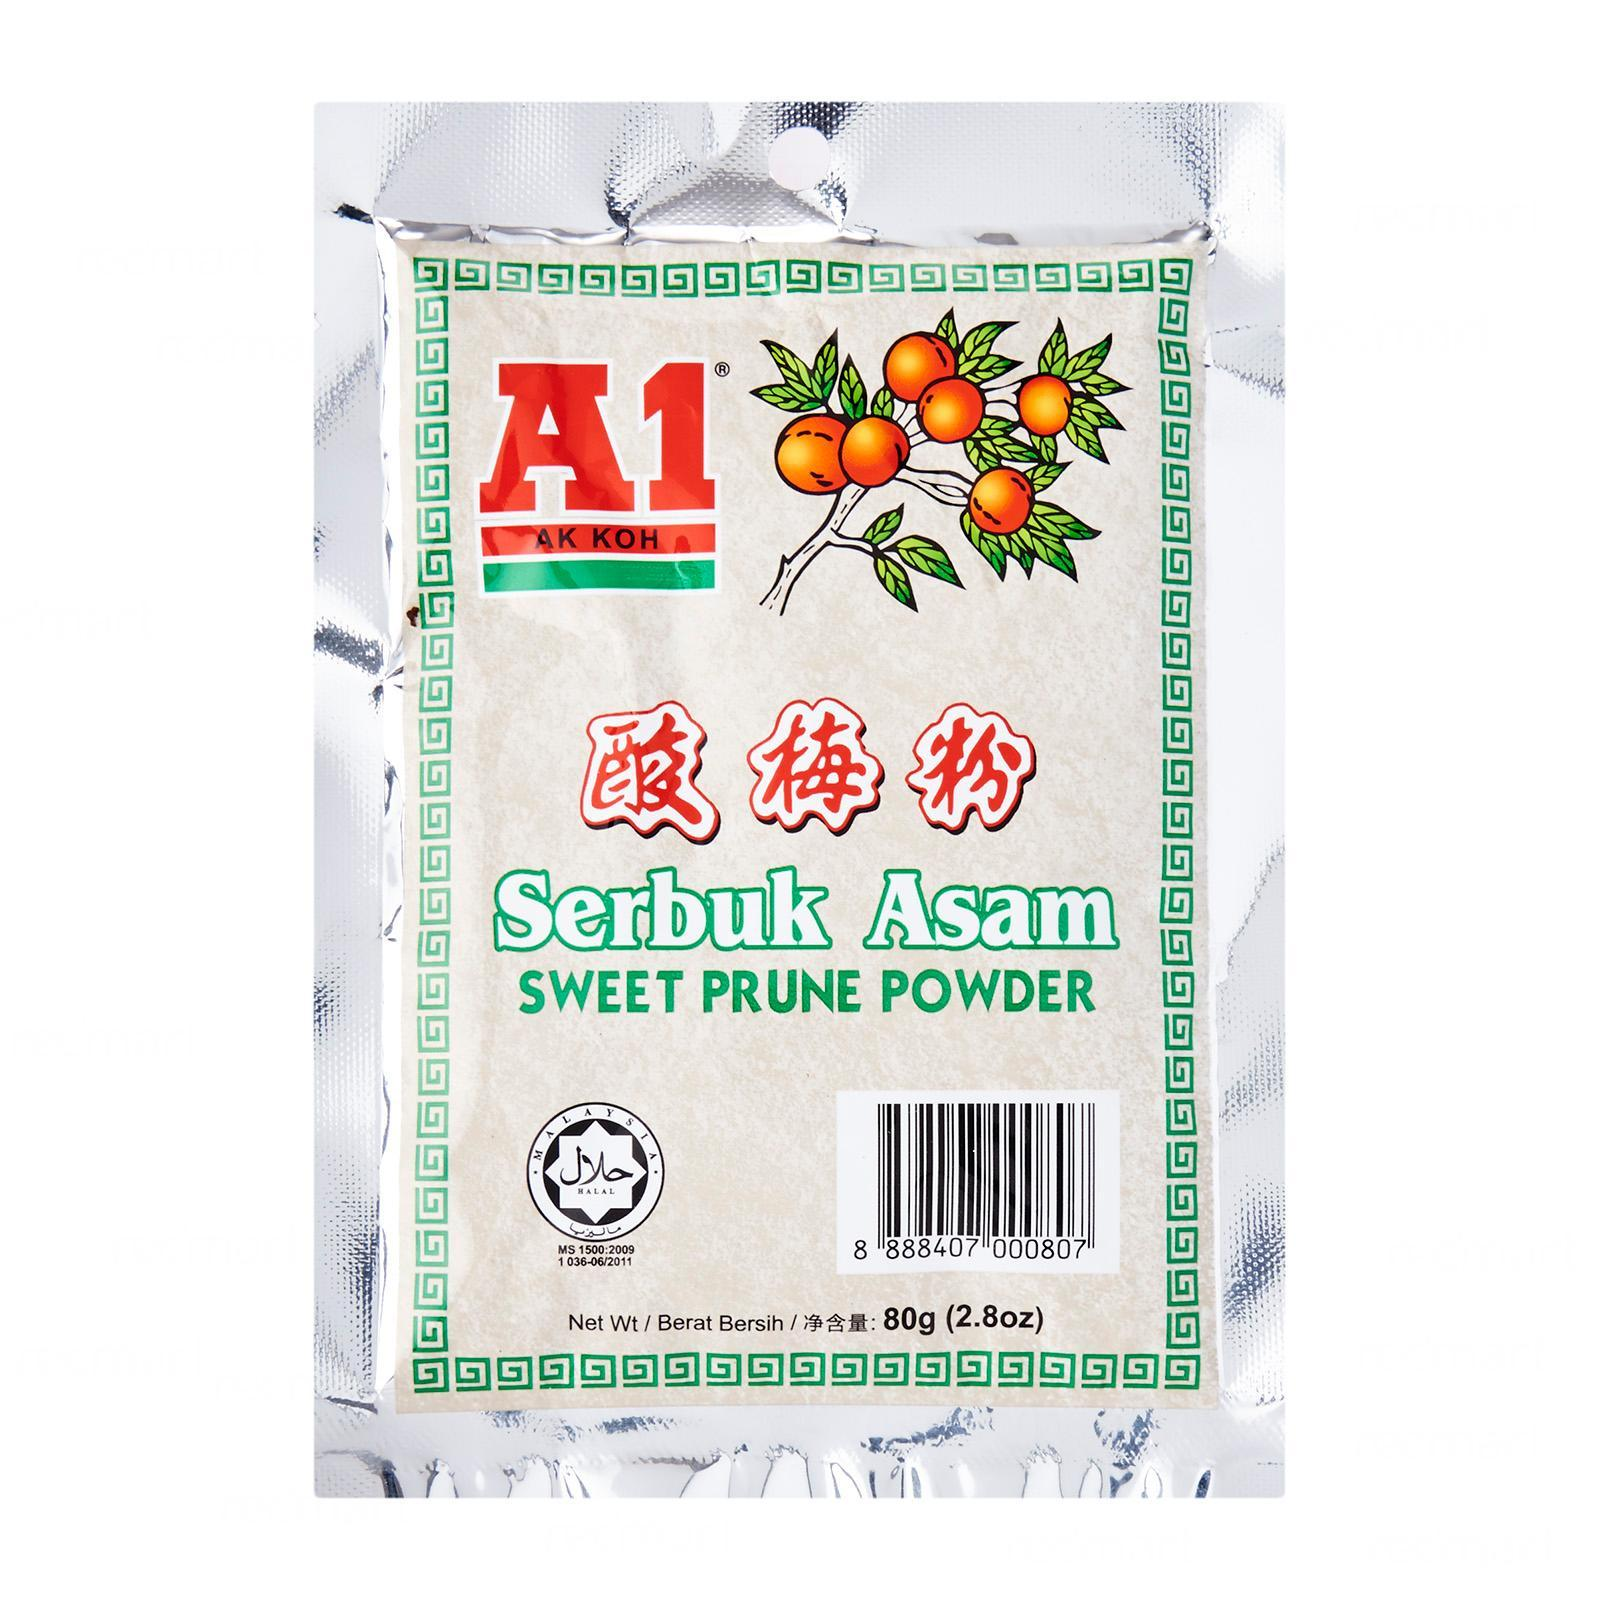 A1 Sweet Prune Powder - By FOOD SERVICE